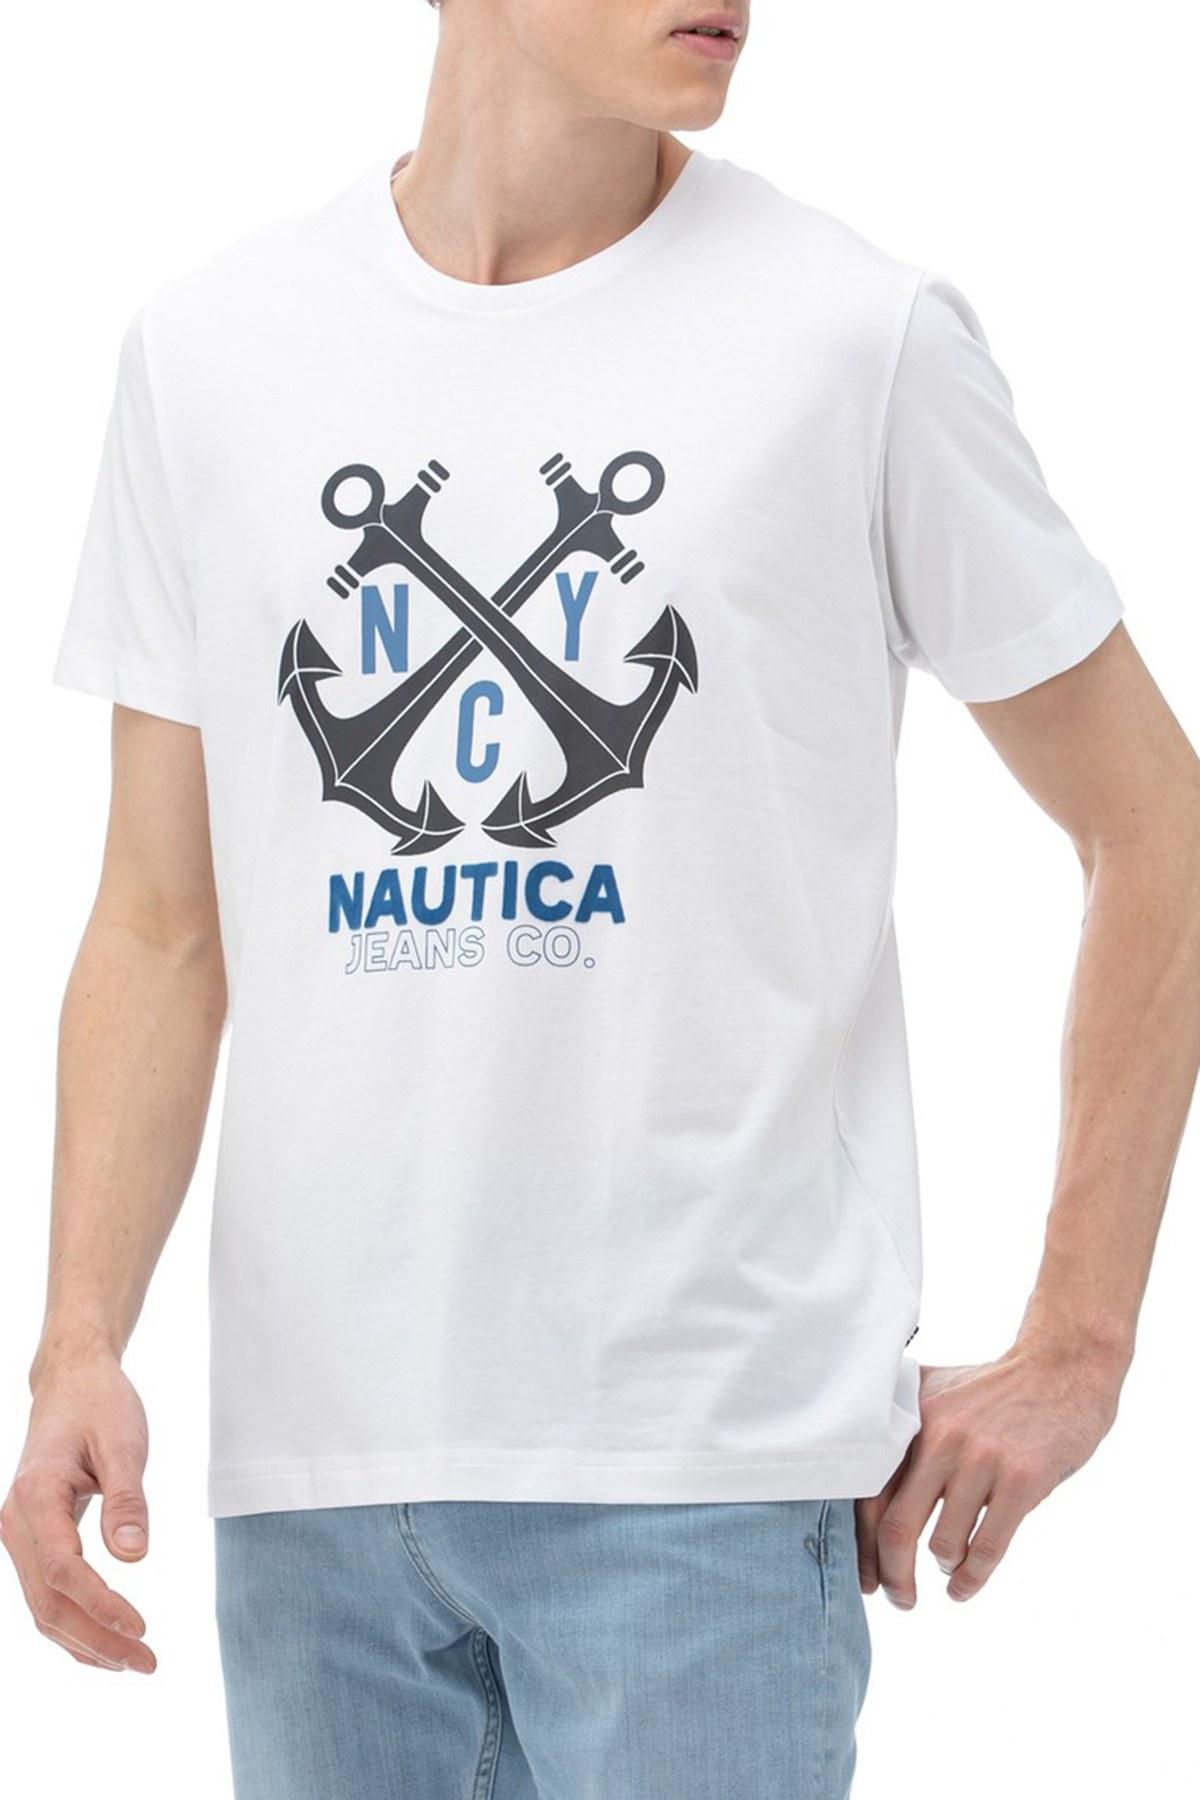 Nautica Pamuklu Baskılı Bisiklet Yaka Erkek T Shirt VR0114T 1BW BEYAZ